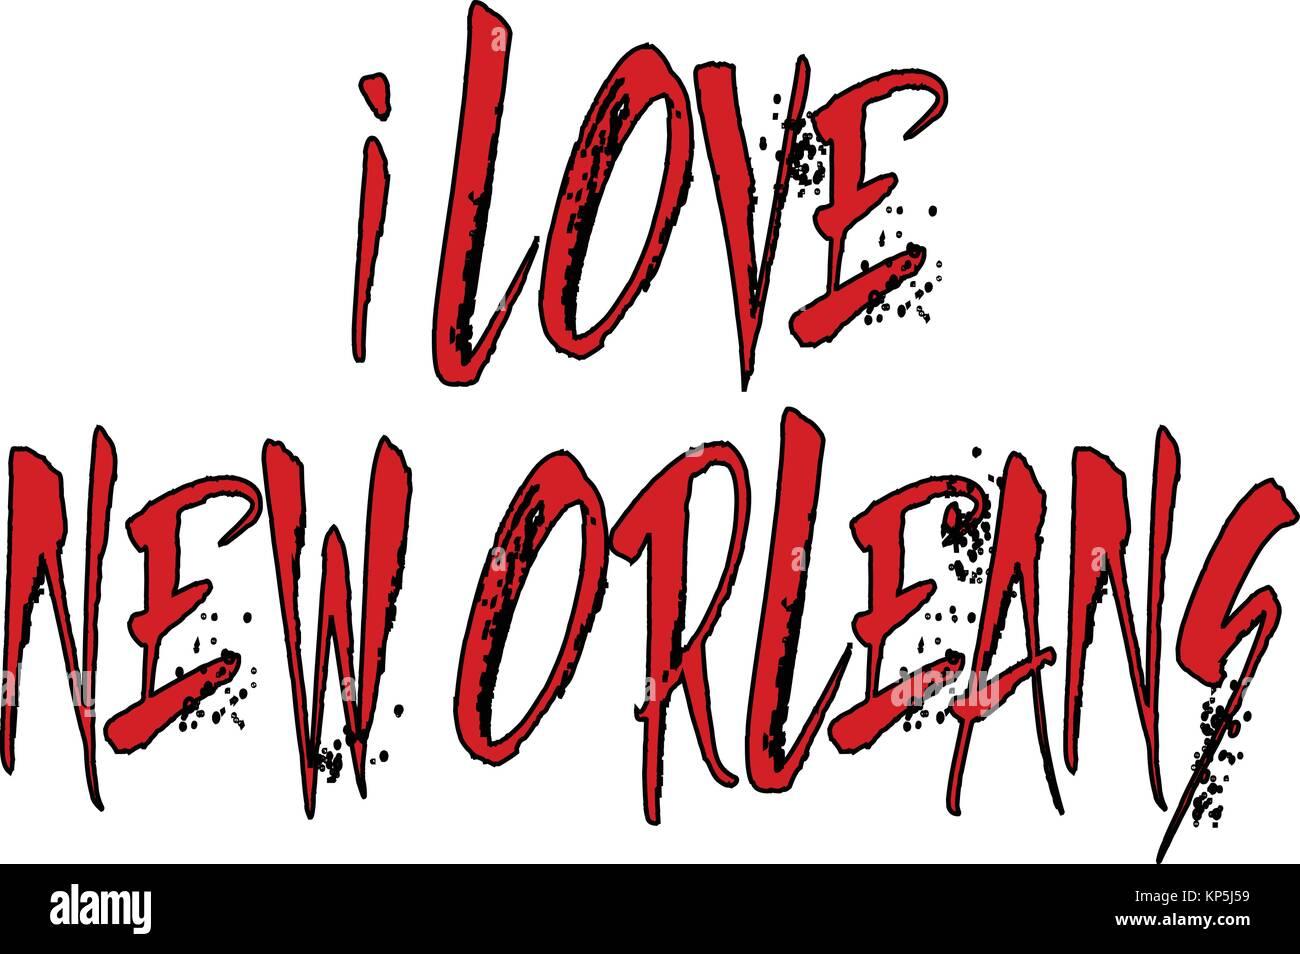 I Love New Orleans text illustration on white background - Stock Image